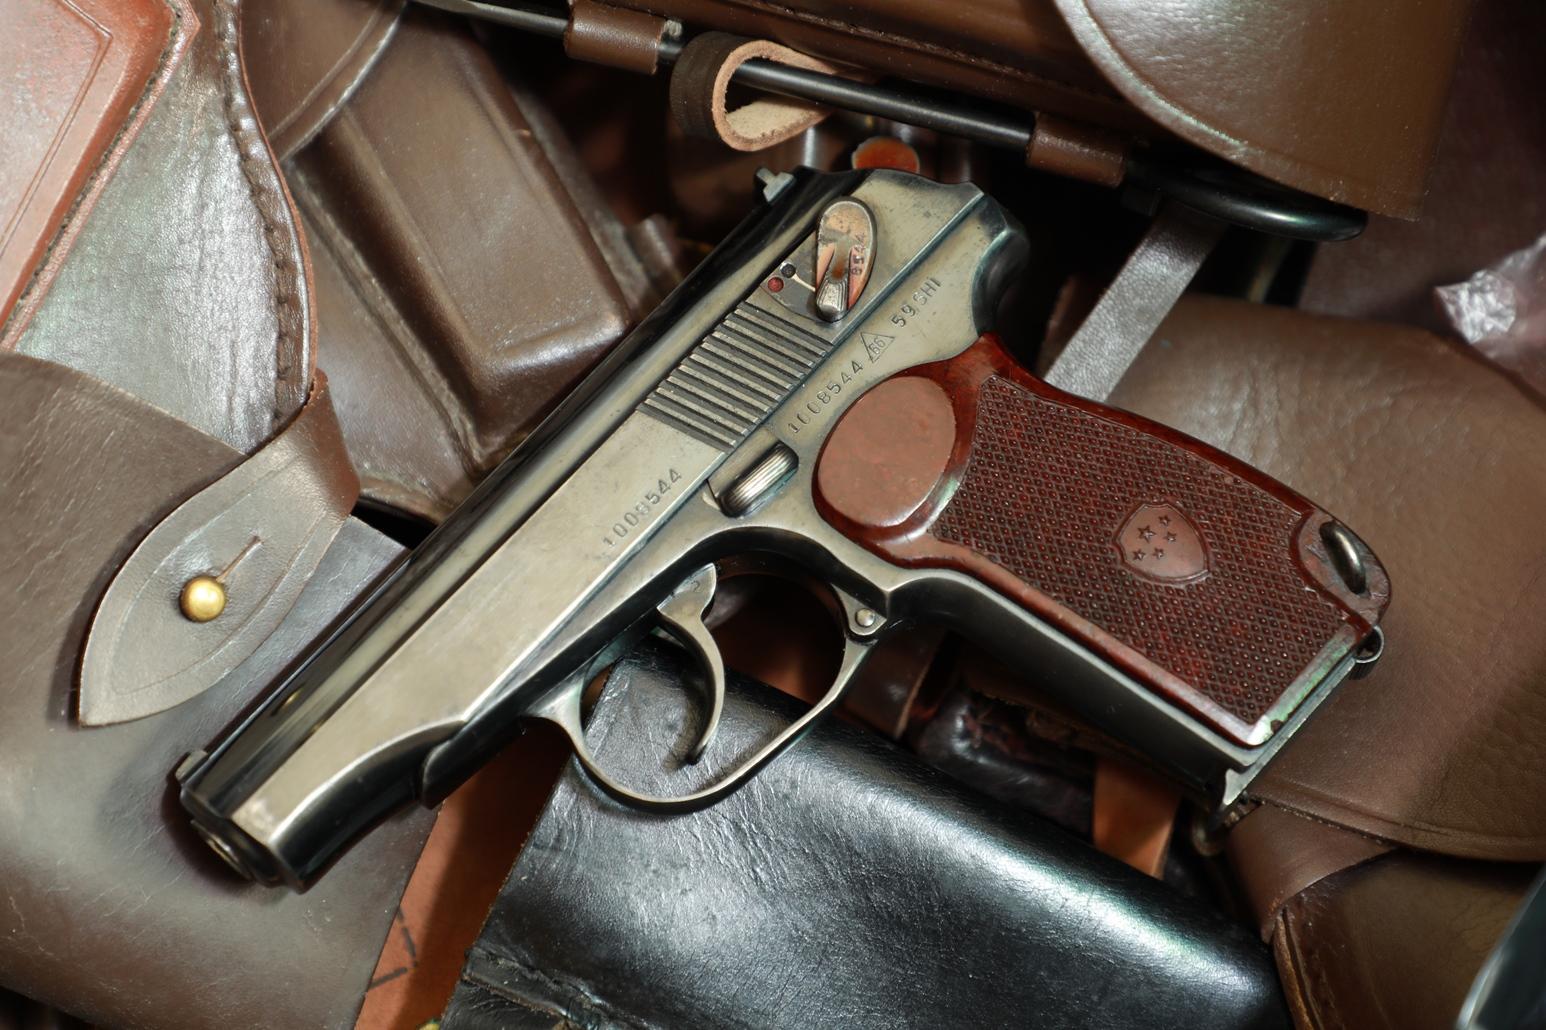 Фото Китайский пистолет Макарова Тип 59 №1008544, 1959 год